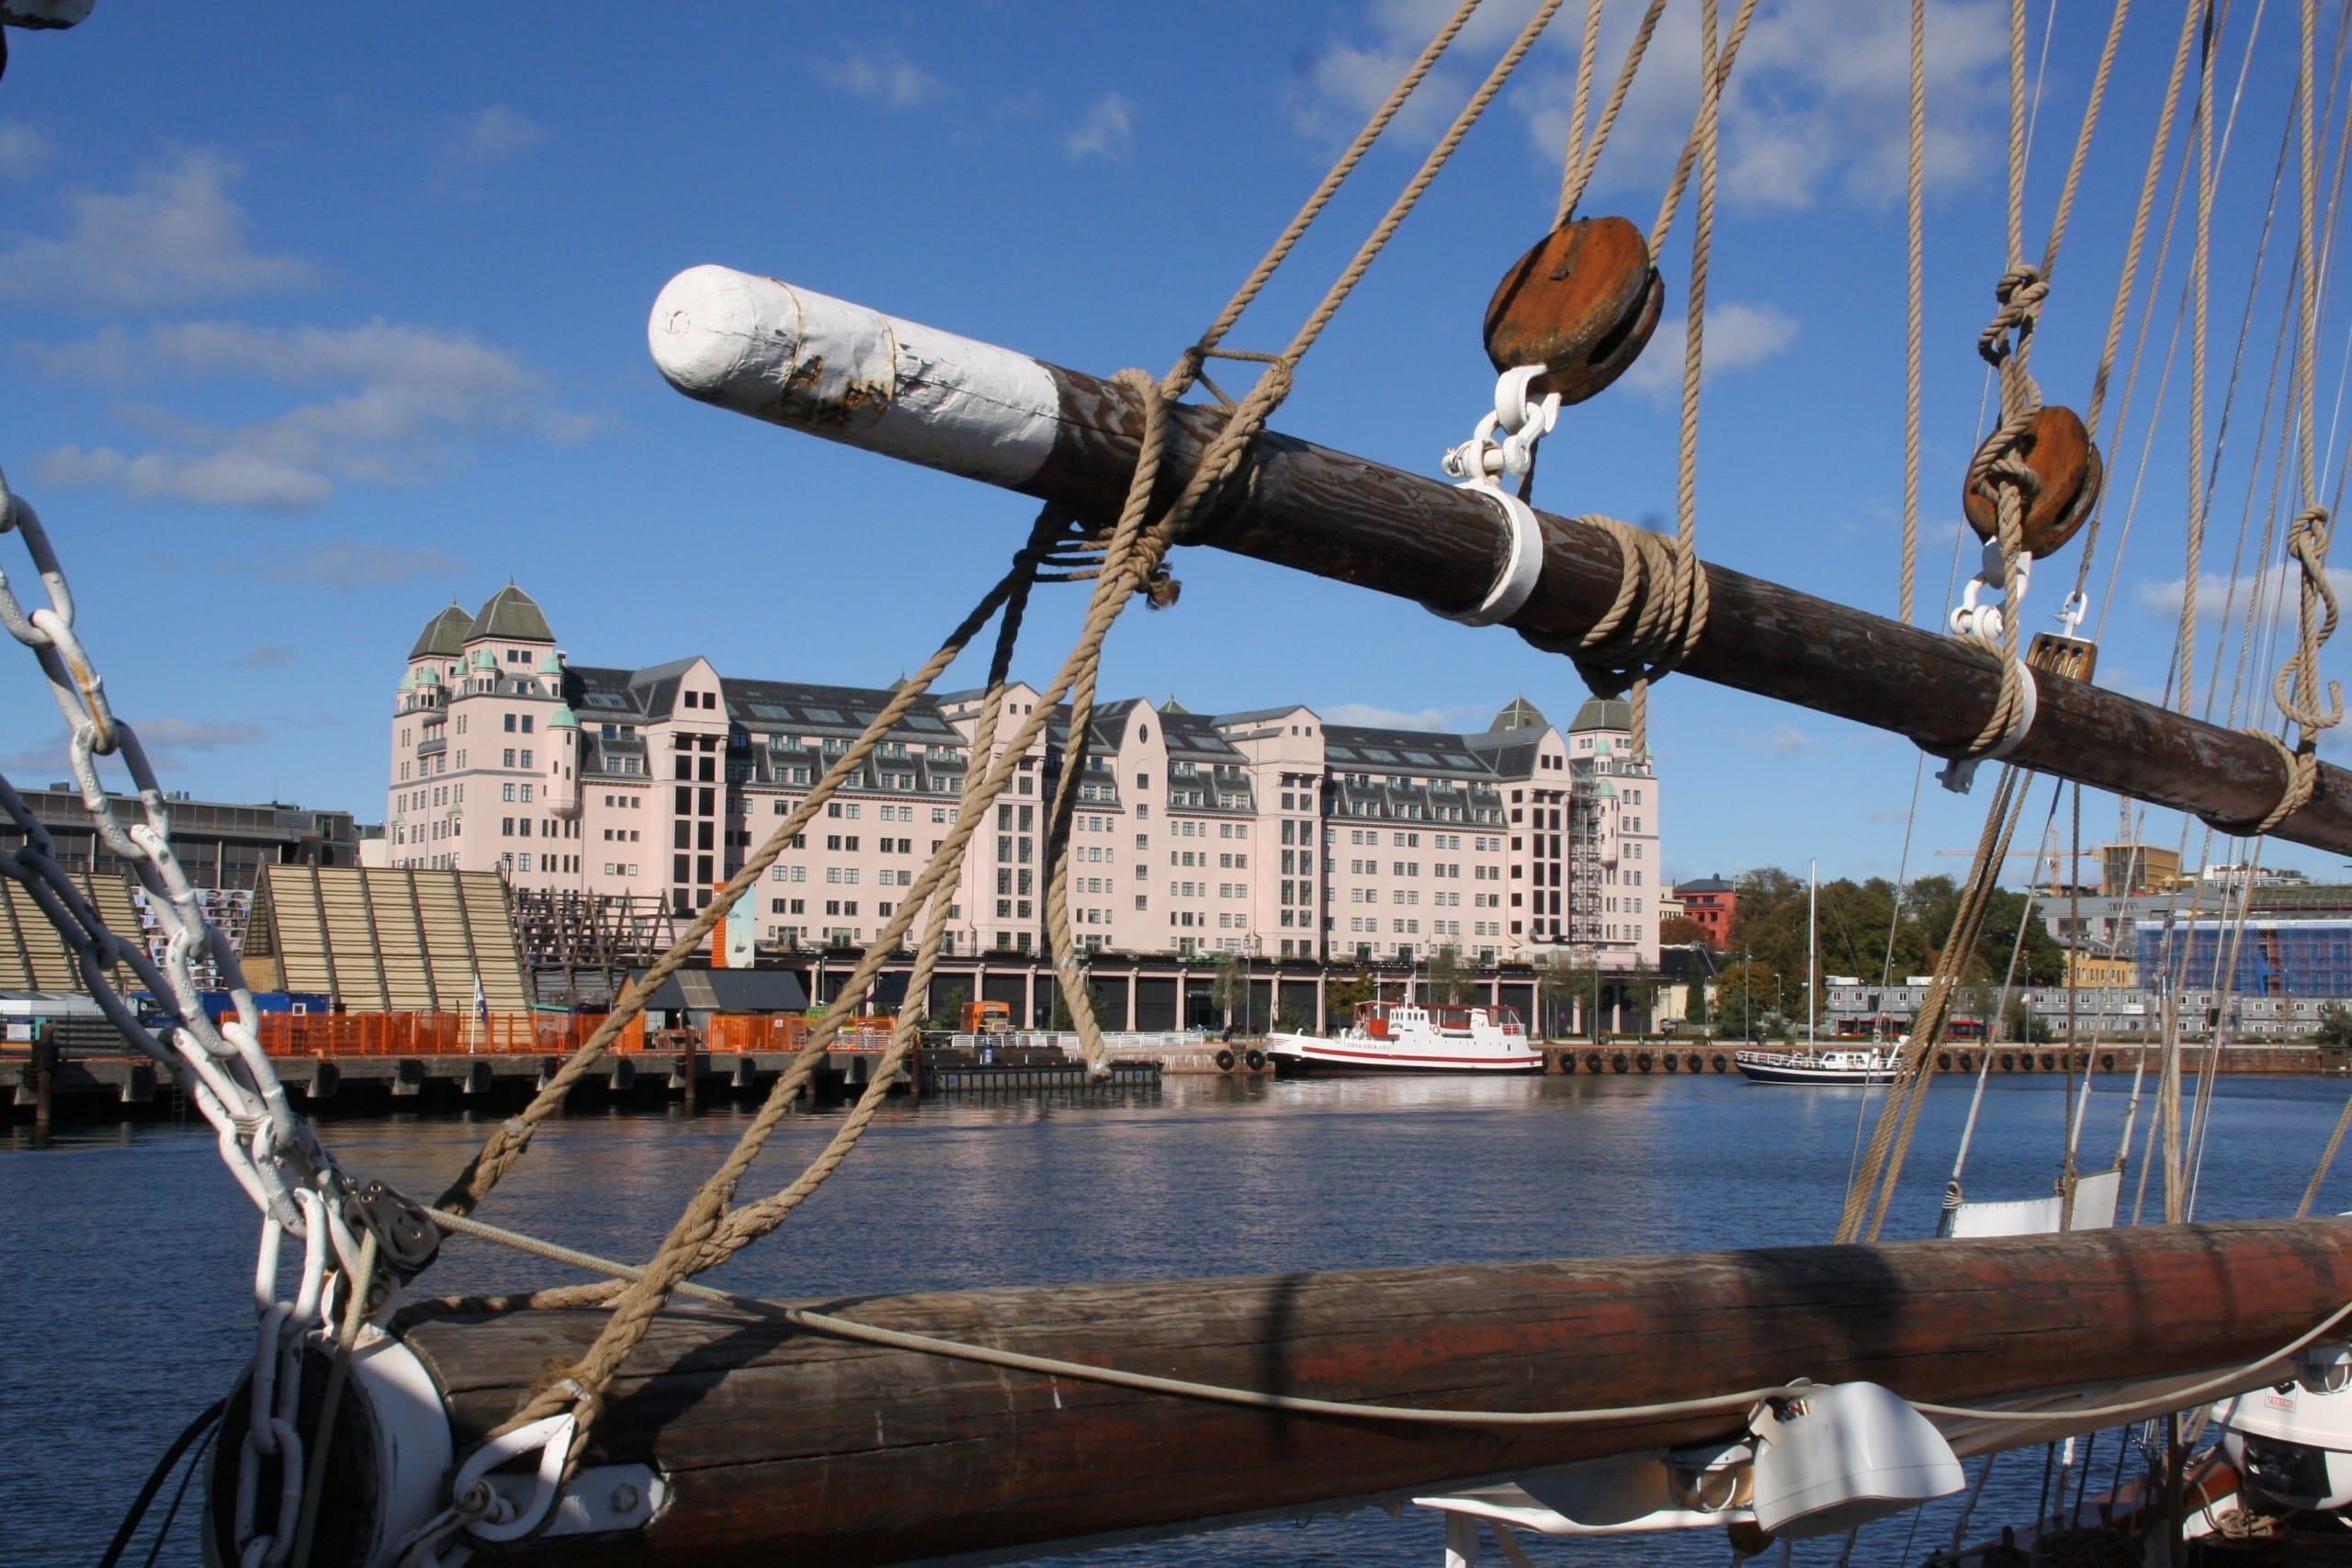 Views on the Oslofjord cruise